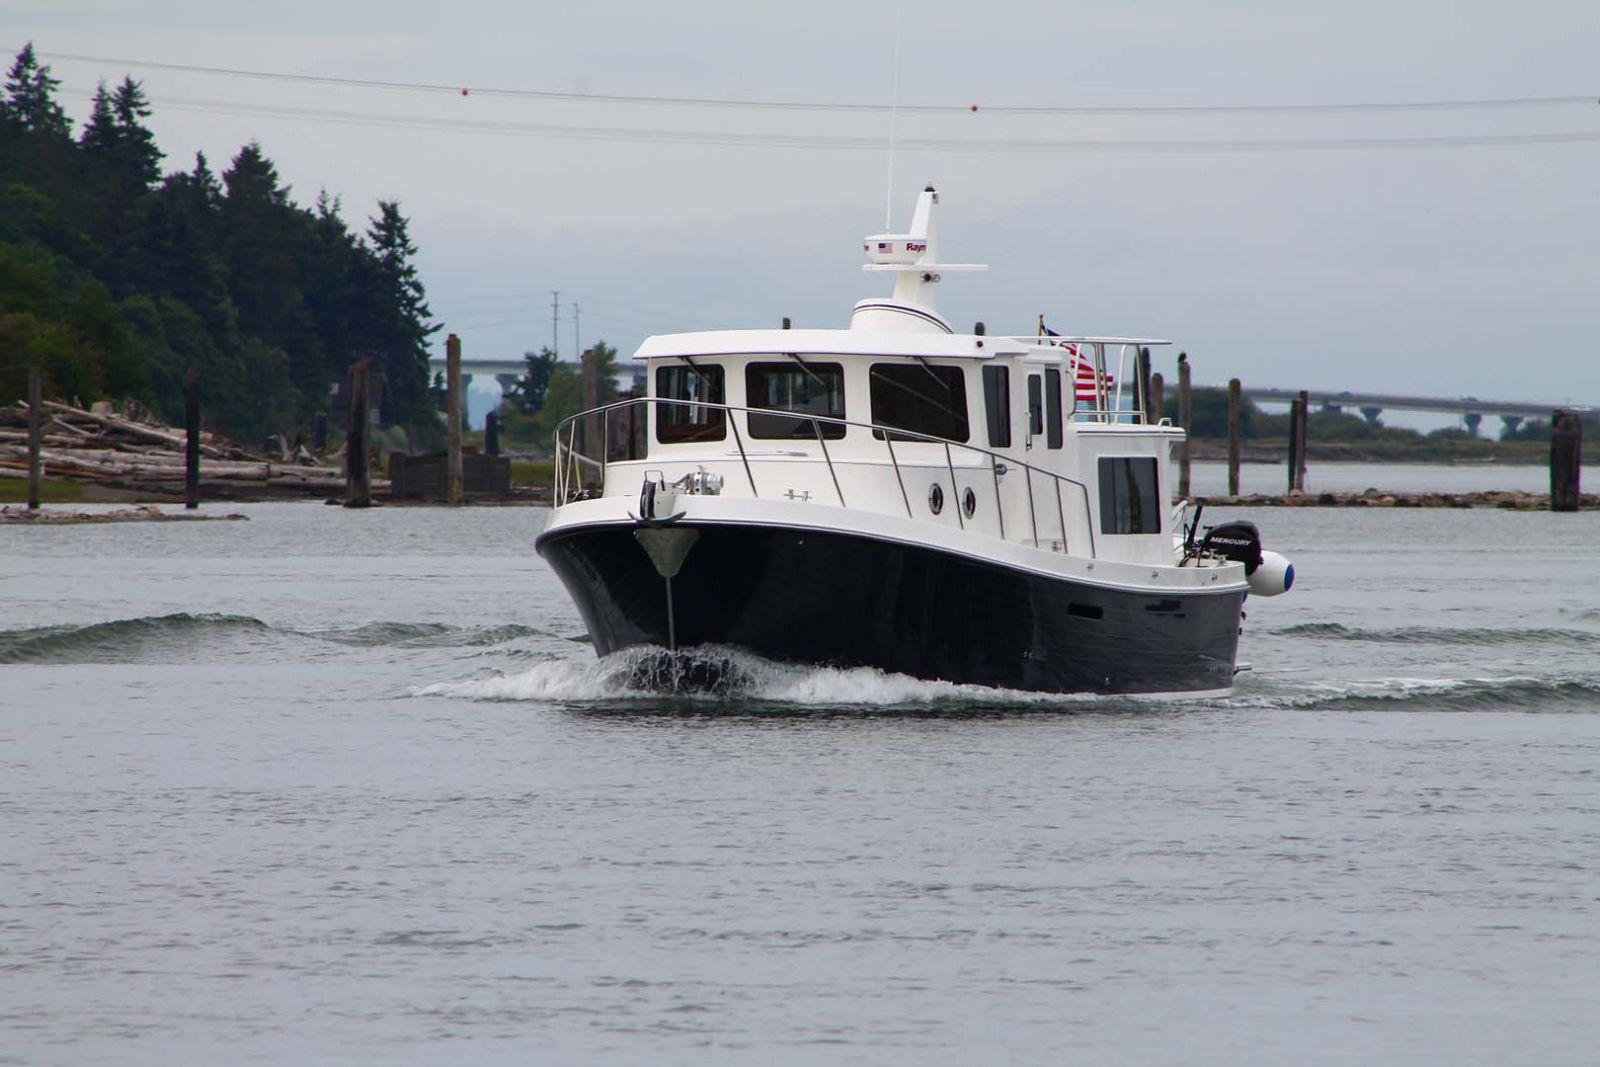 american tug 365 dark hull